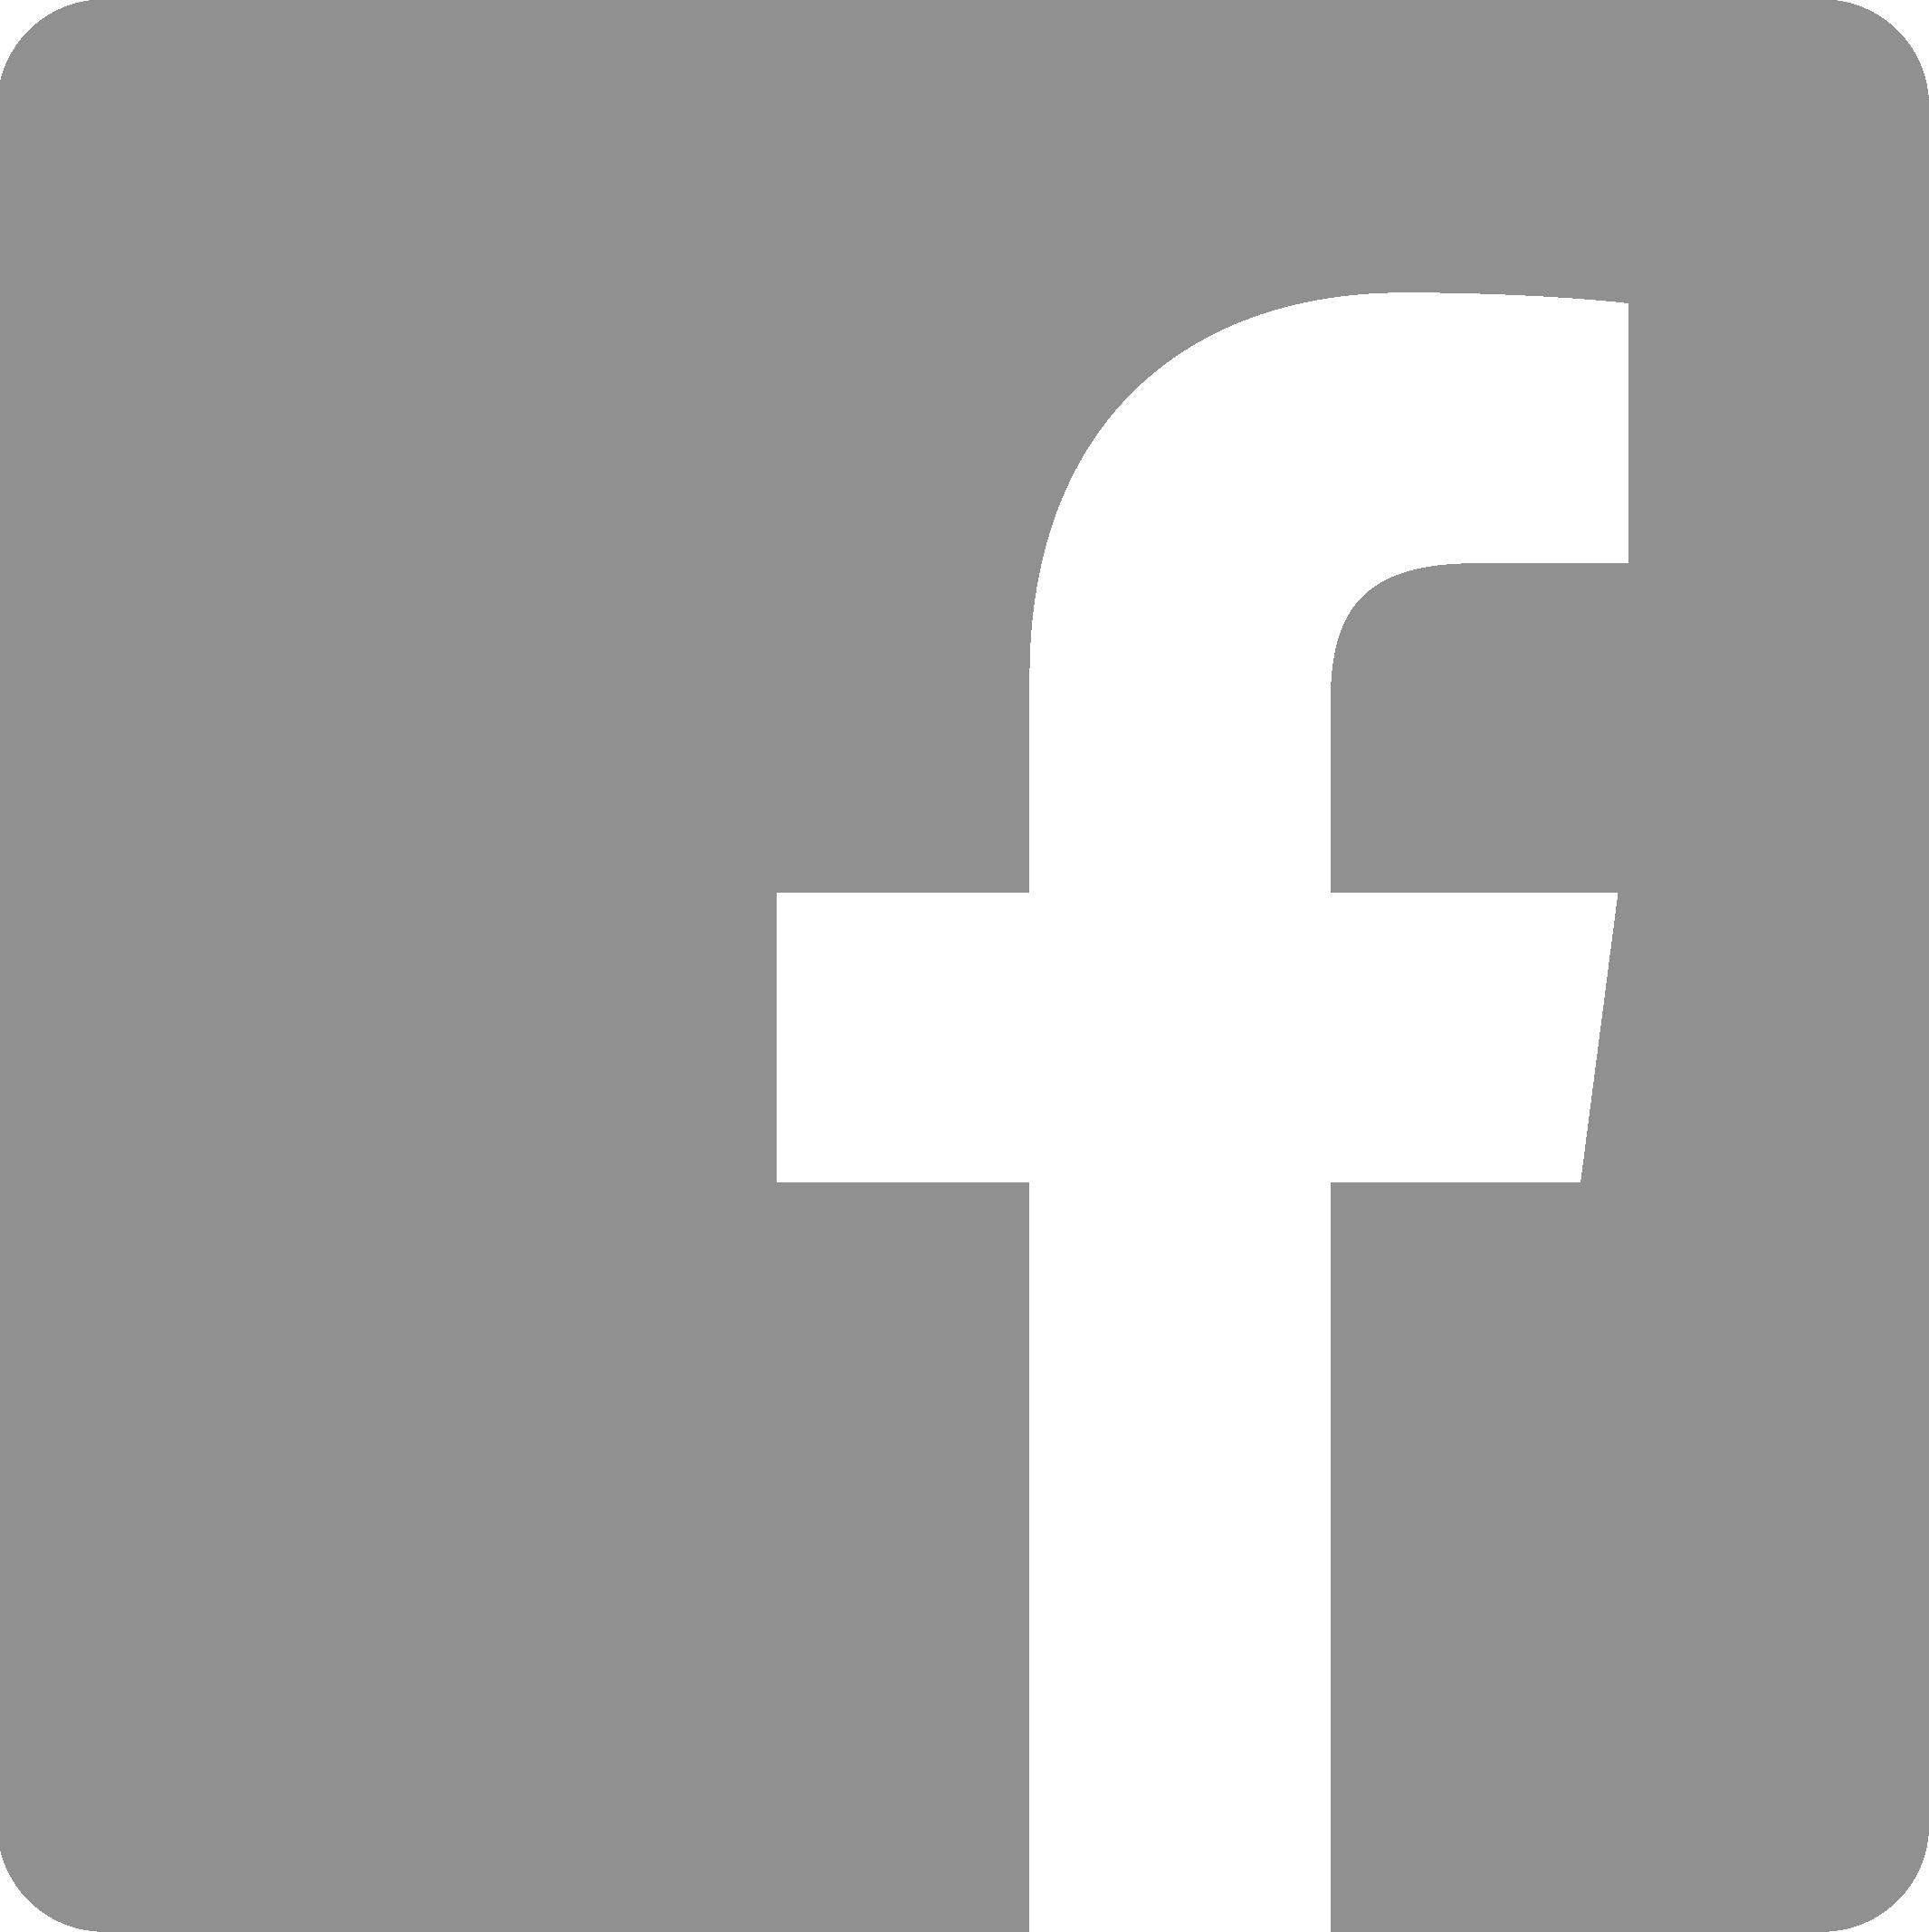 FB-fLogo-2016